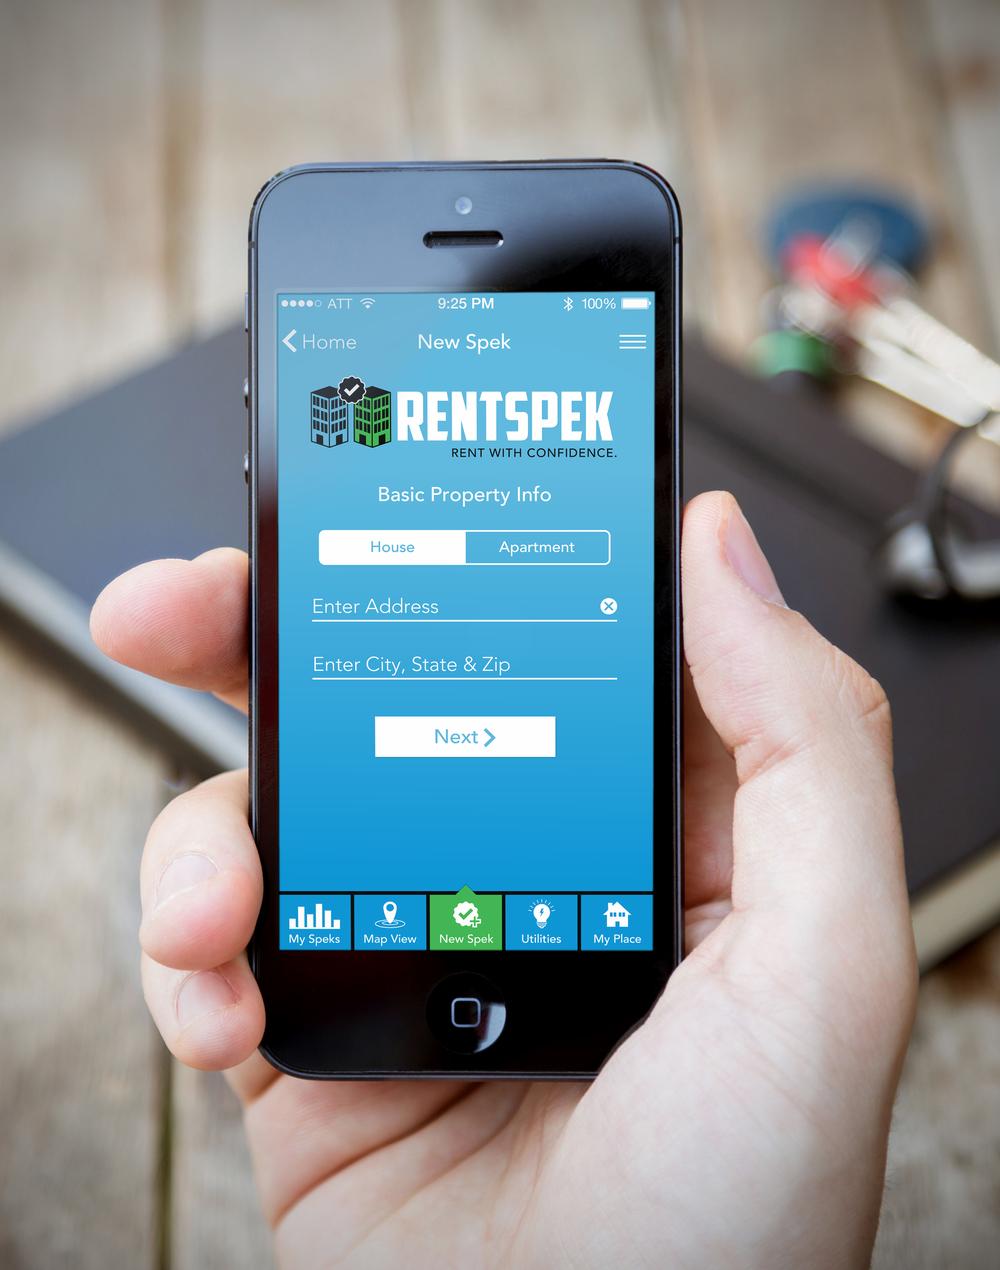 RentSpek Logo & UI Design  [Image 2/3]  Client: RentSpek LLC